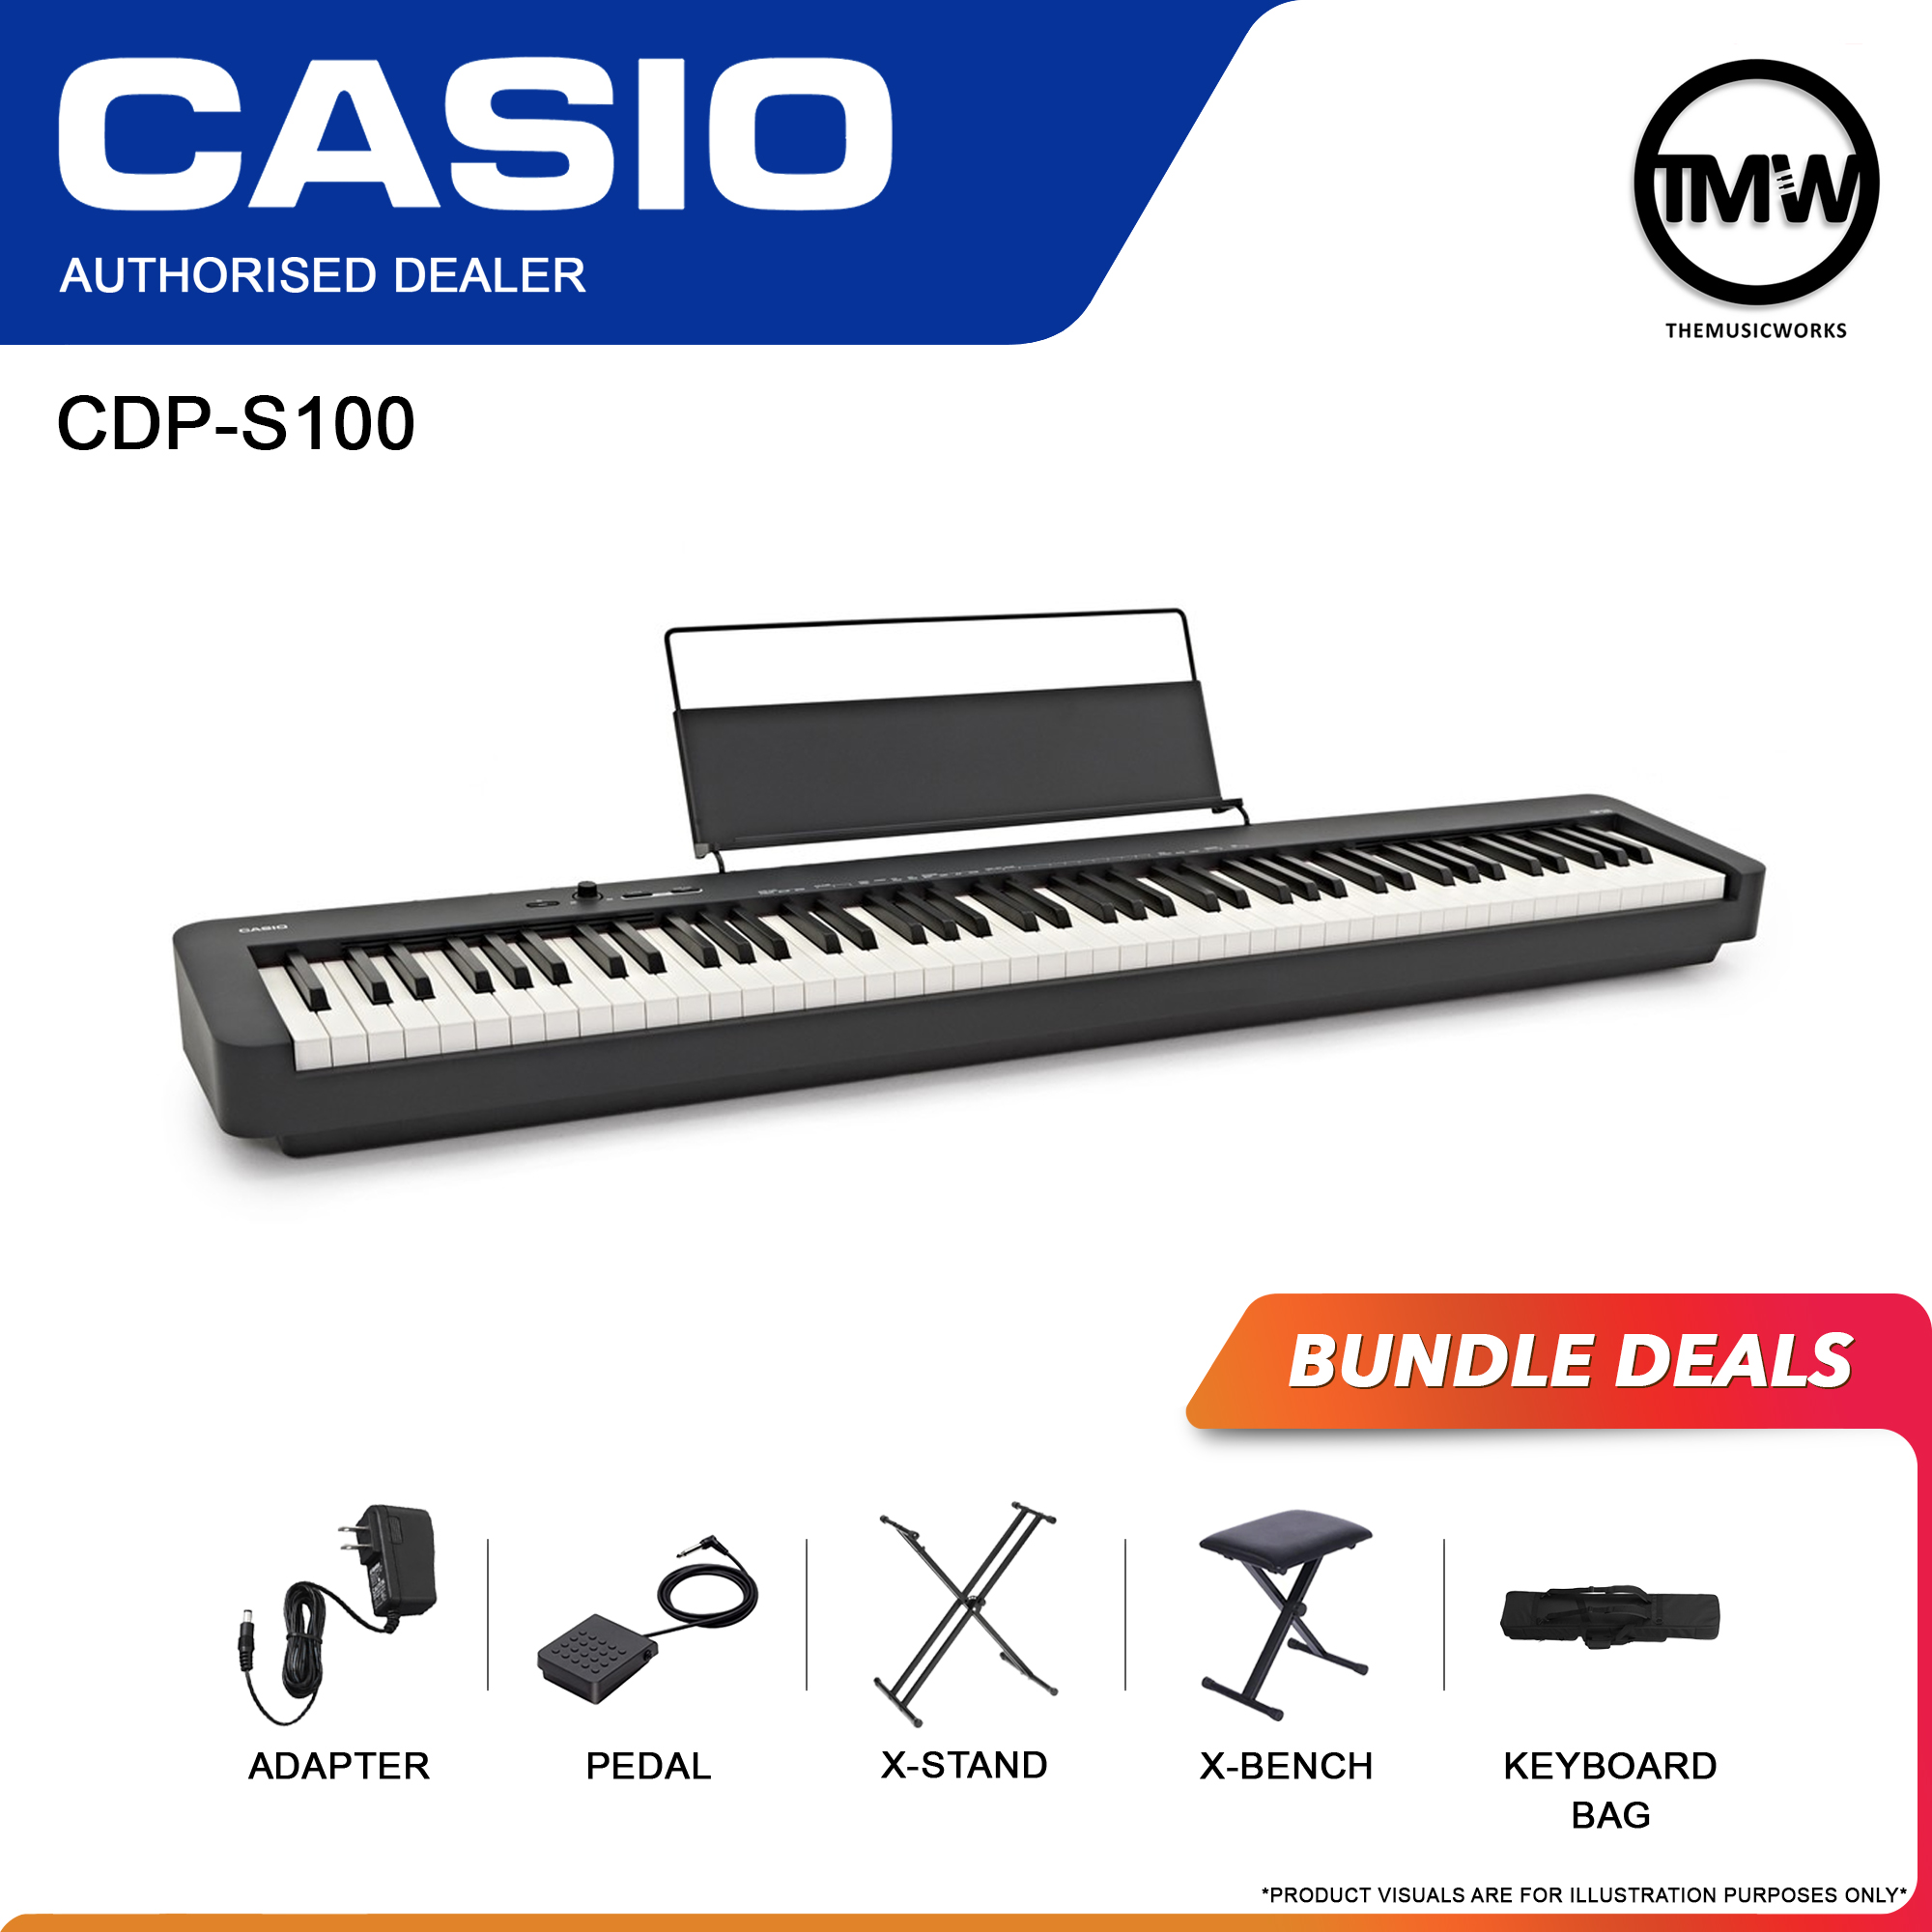 casio cdp-s100 bundle deals